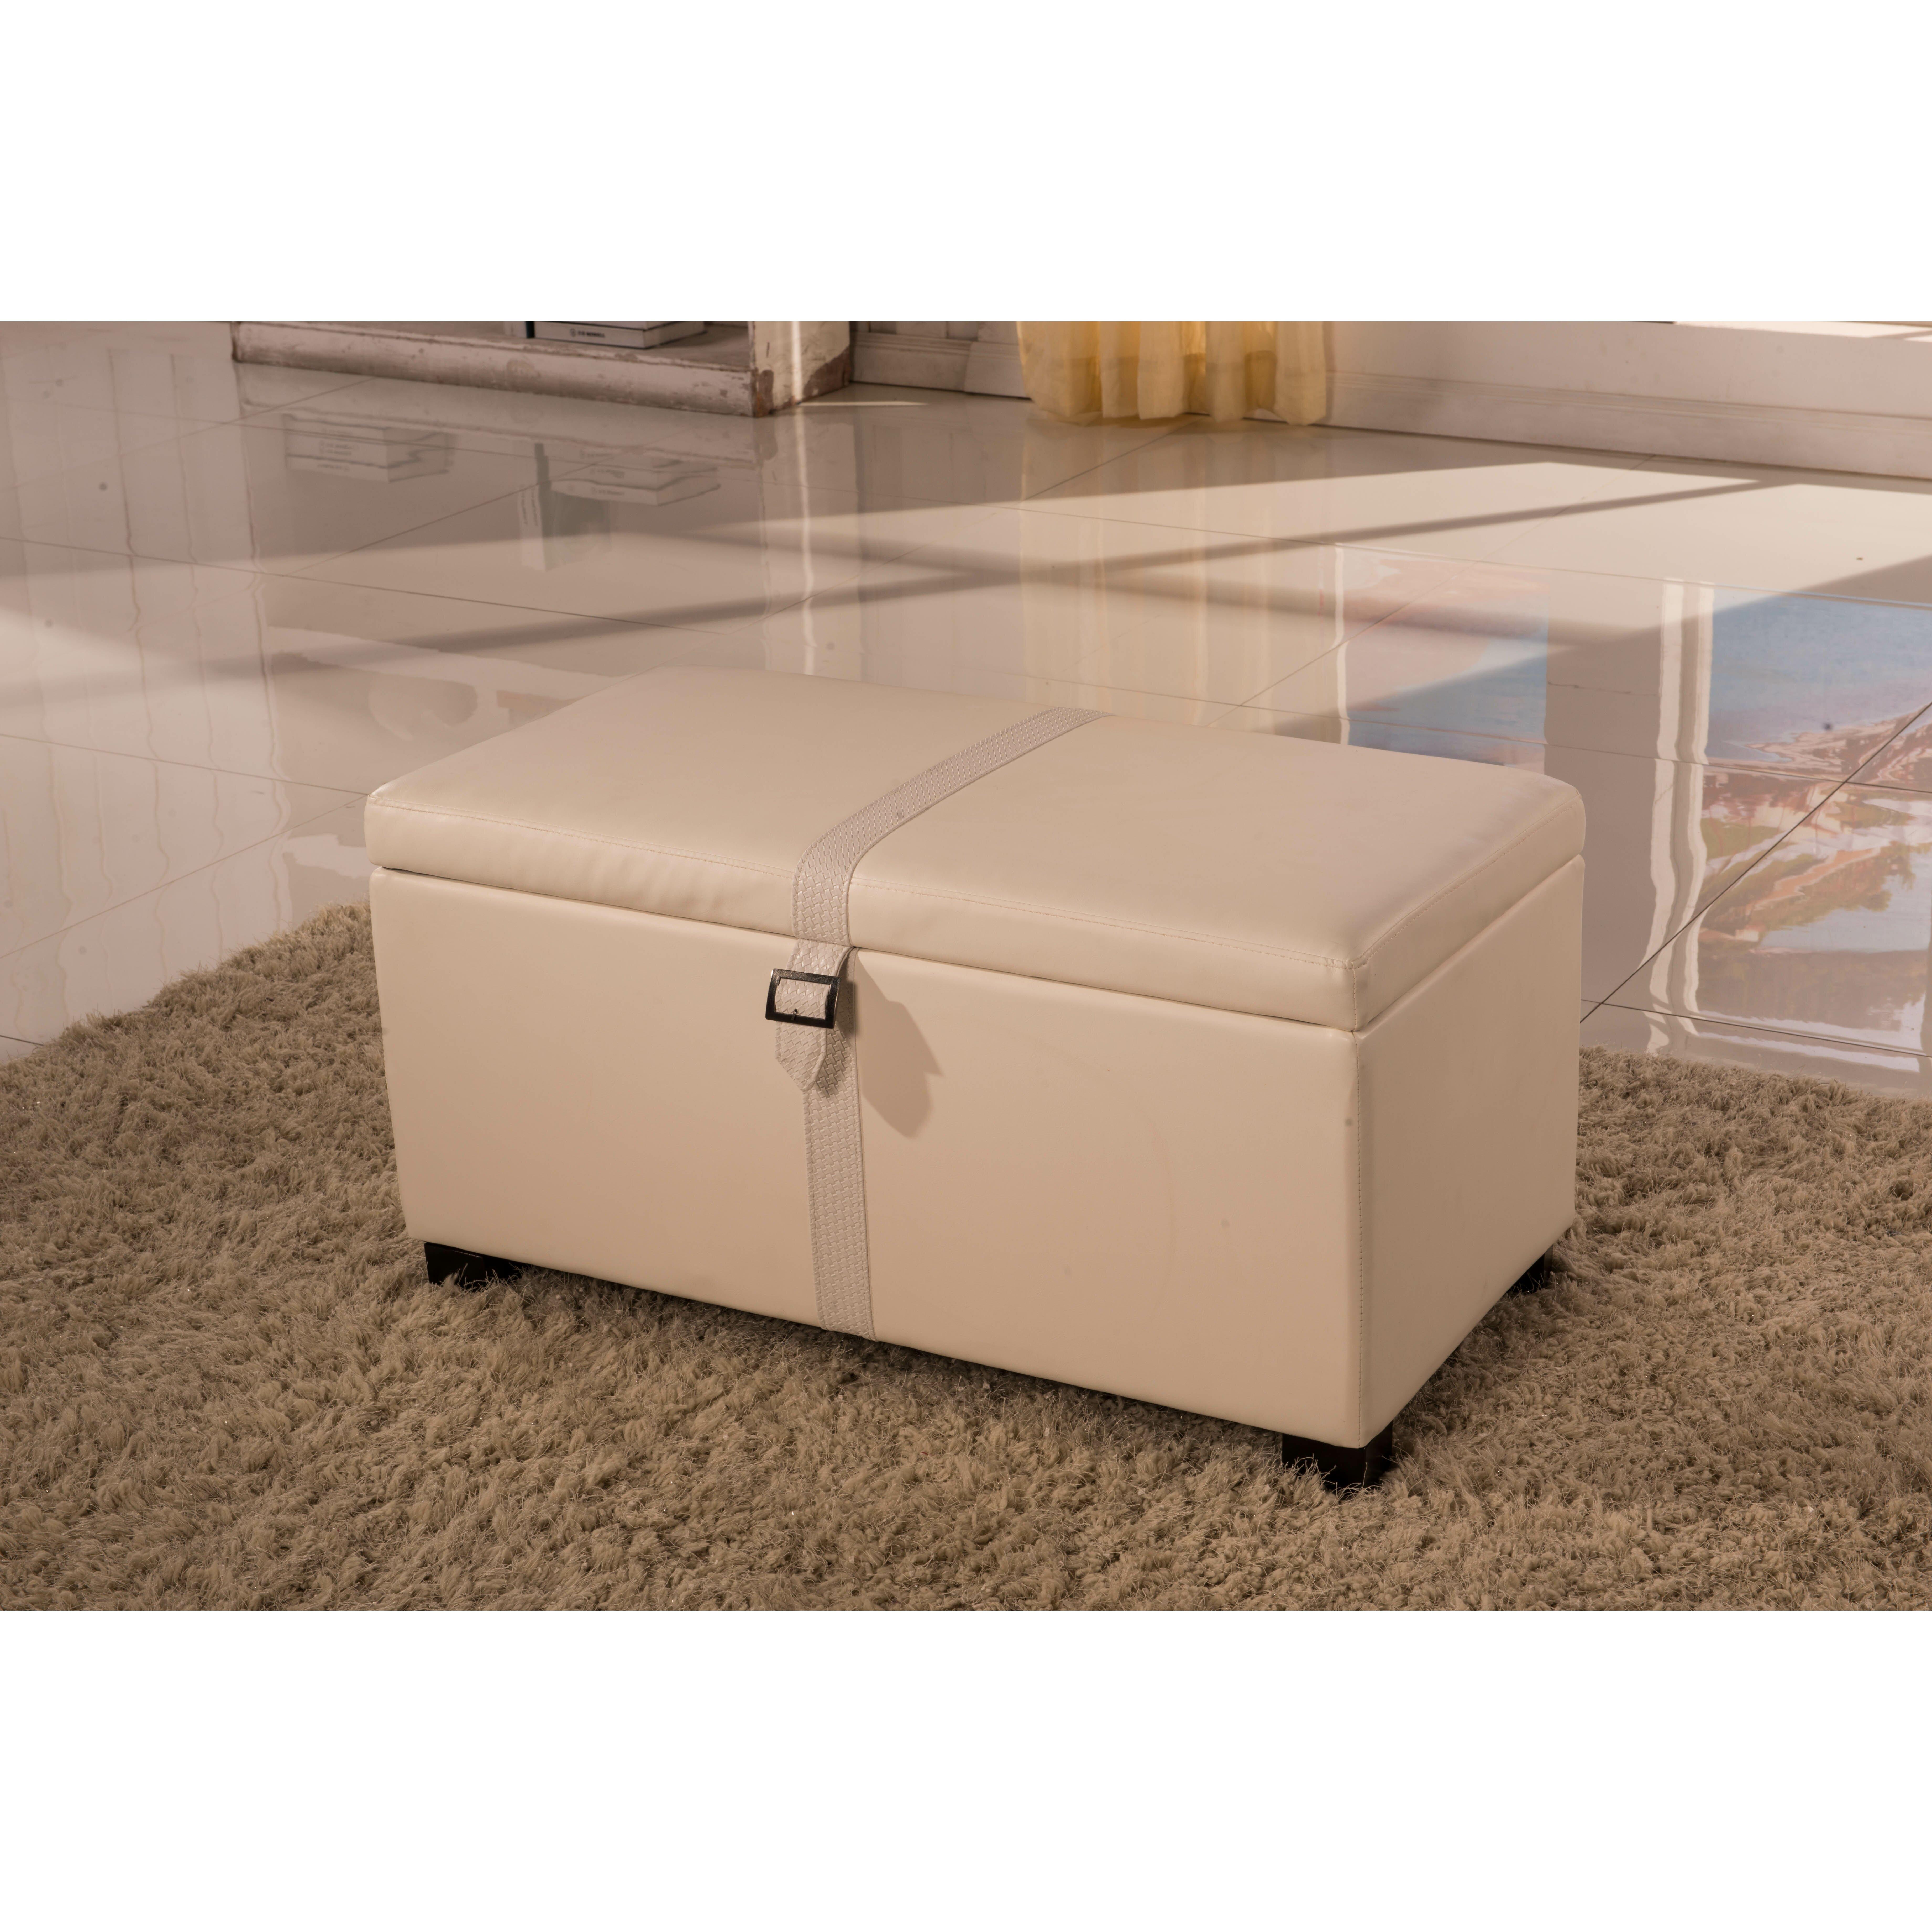 Noya Usa Castilian Upholstered Storage Bedroom Bench: NOYA USA Classic Storage Bedroom Bench